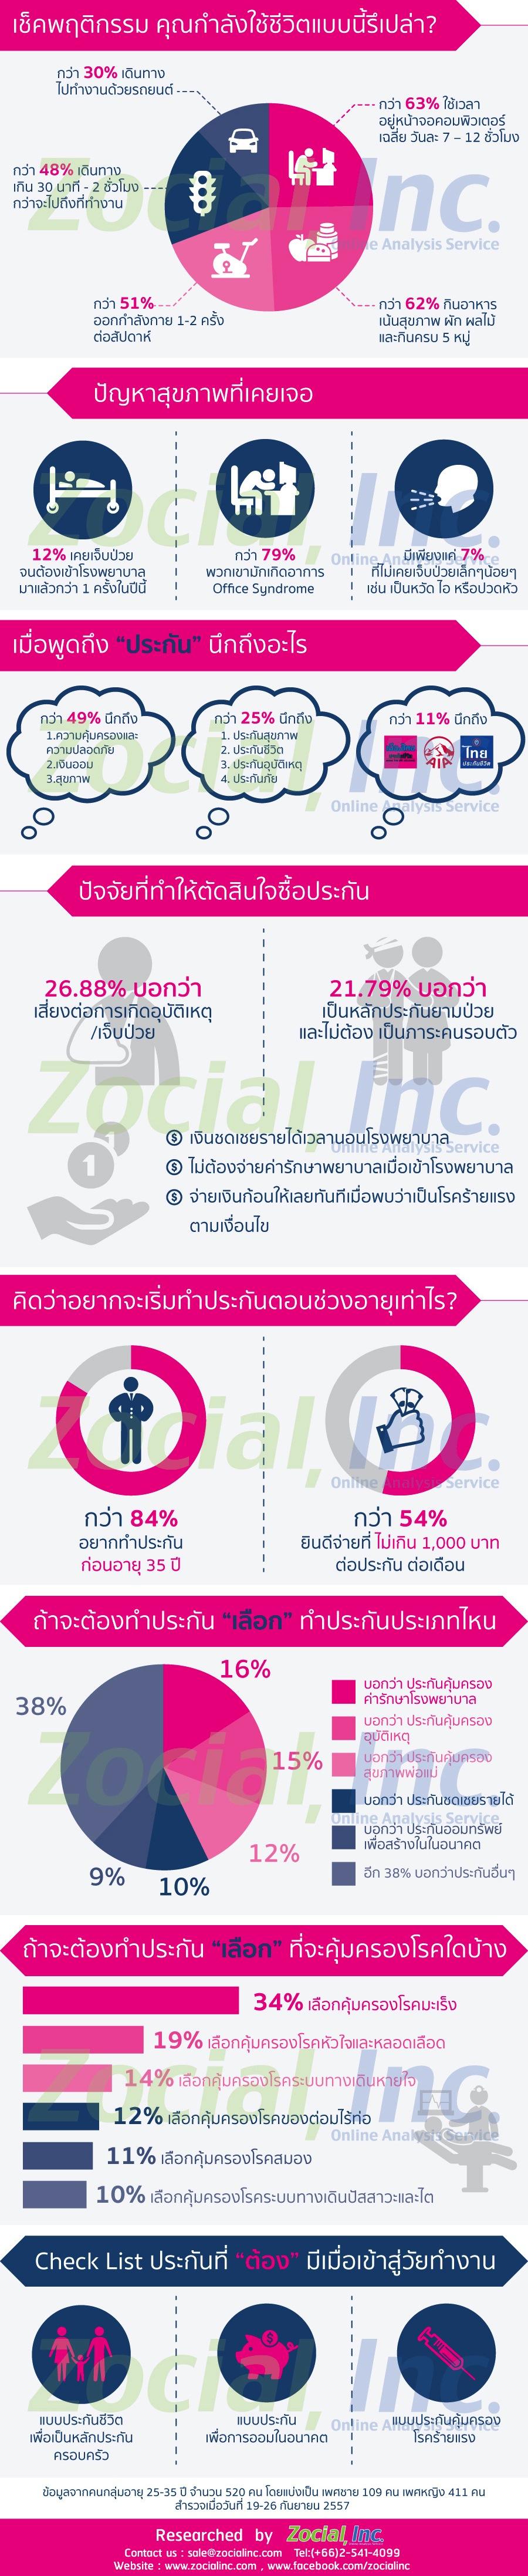 Infographic Salaryman Risk